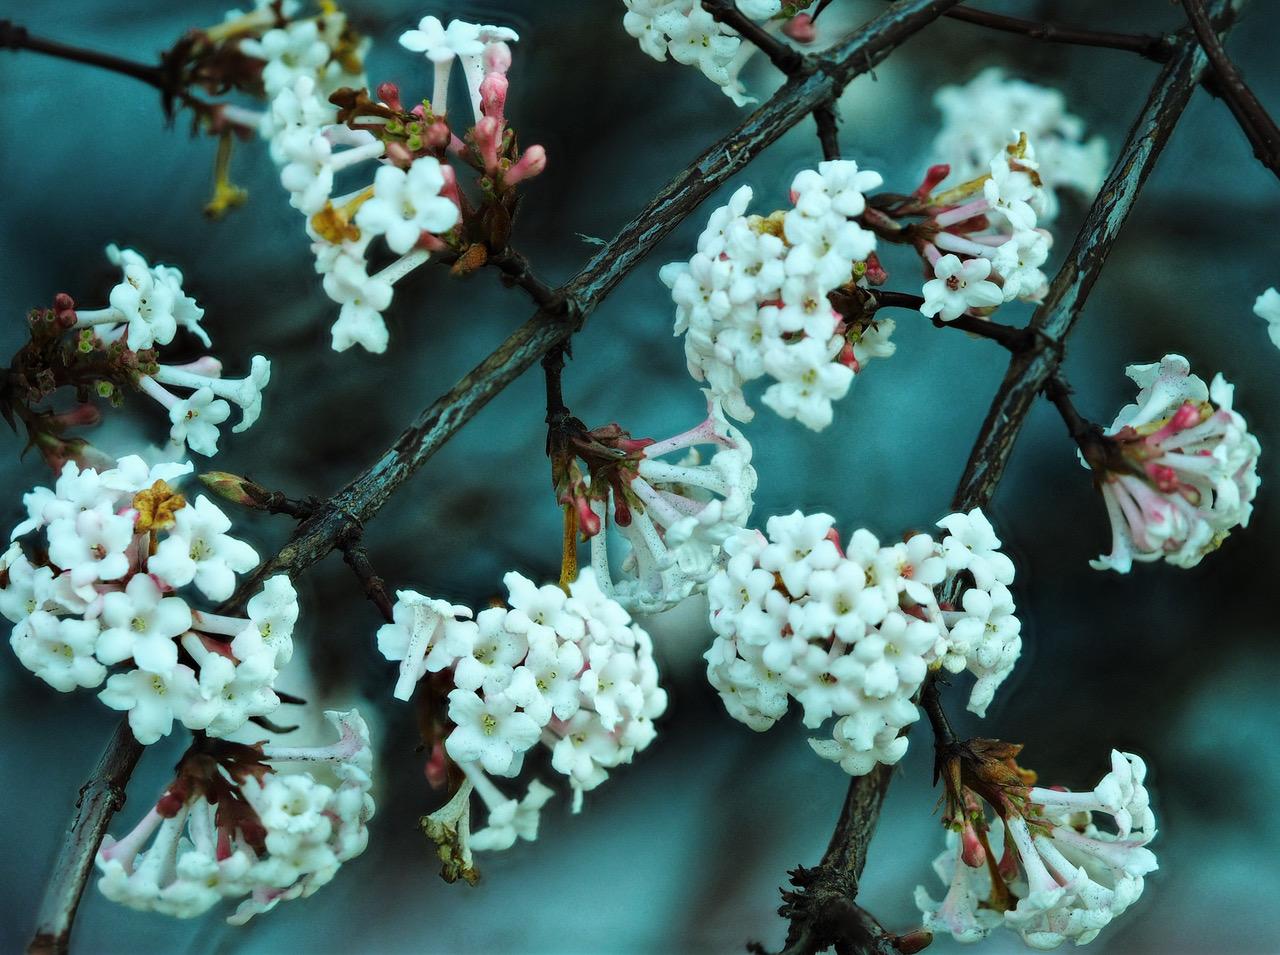 Pflanze des Monats Januar: Der Duftende Schneeball (Viburnum farreri STEARN, syn.: V. fragrans BUNGE non LOISEL)